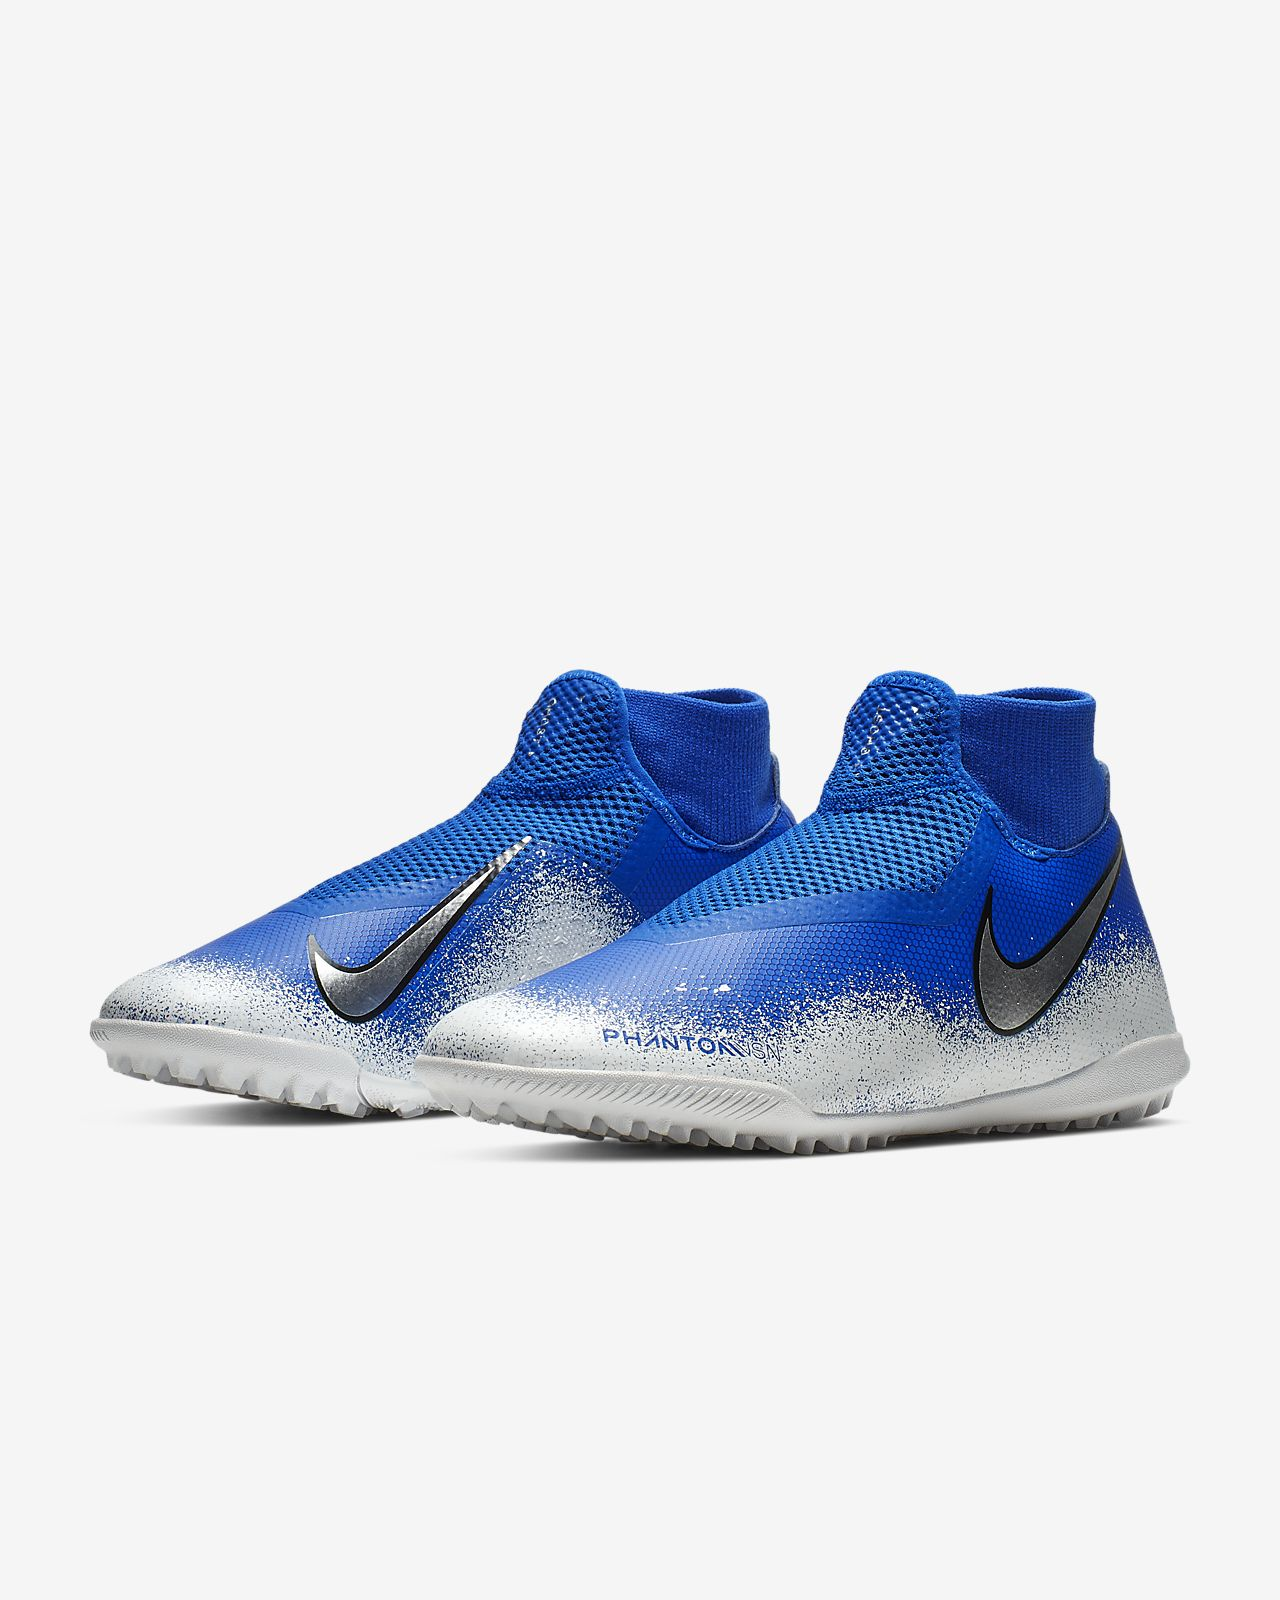 online retailer cdba5 c4226 ... Fotbollssko för grus turf Nike Phantom Vision Academy Dynamic Fit